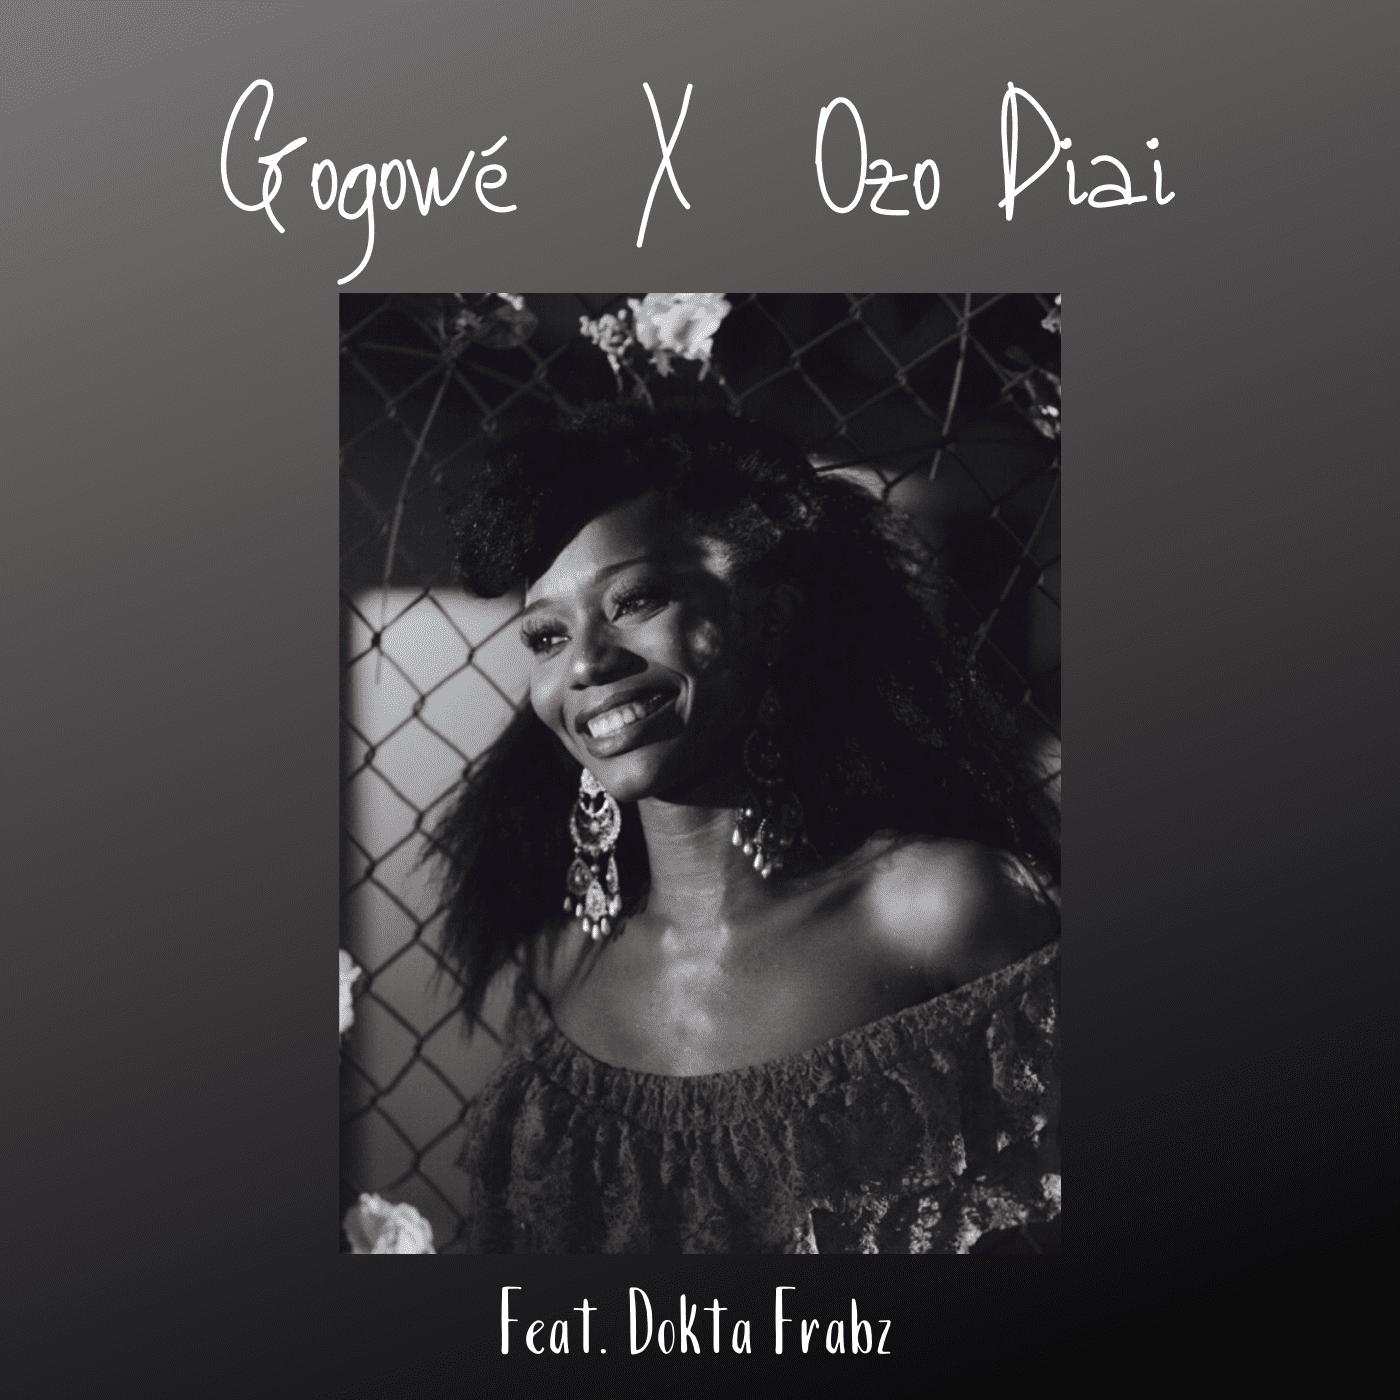 Gogowé – Gogowé X Ozo Diai (Feat. Dokta Frabz)